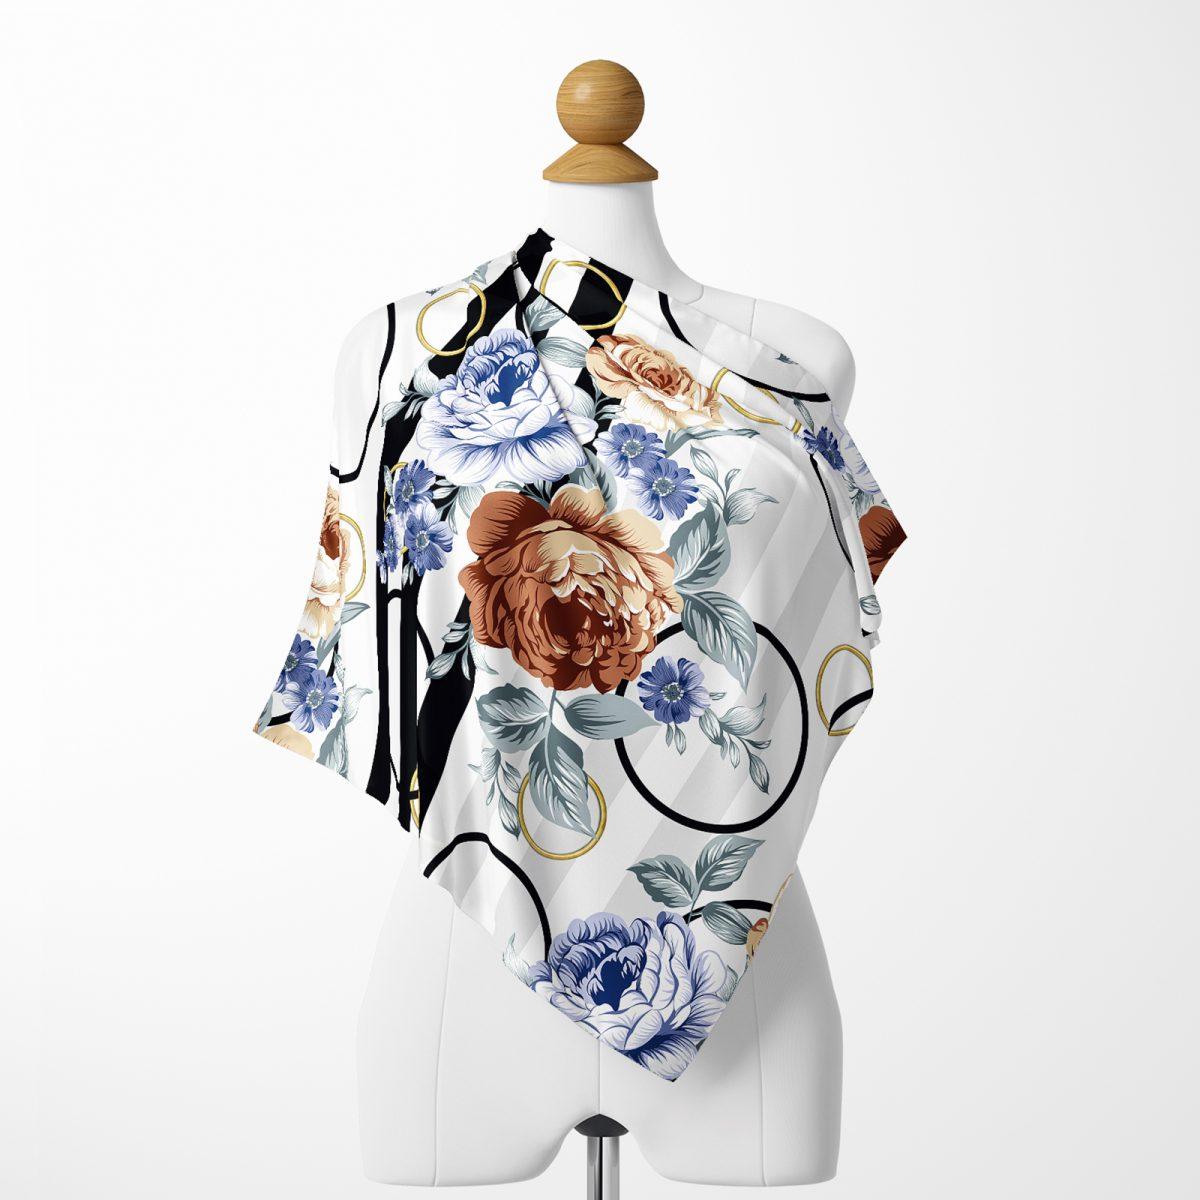 RealHomes Moda Özel Tasarım Dijital Baskılı Modern İpeksi Twill Eşarp Realhomes